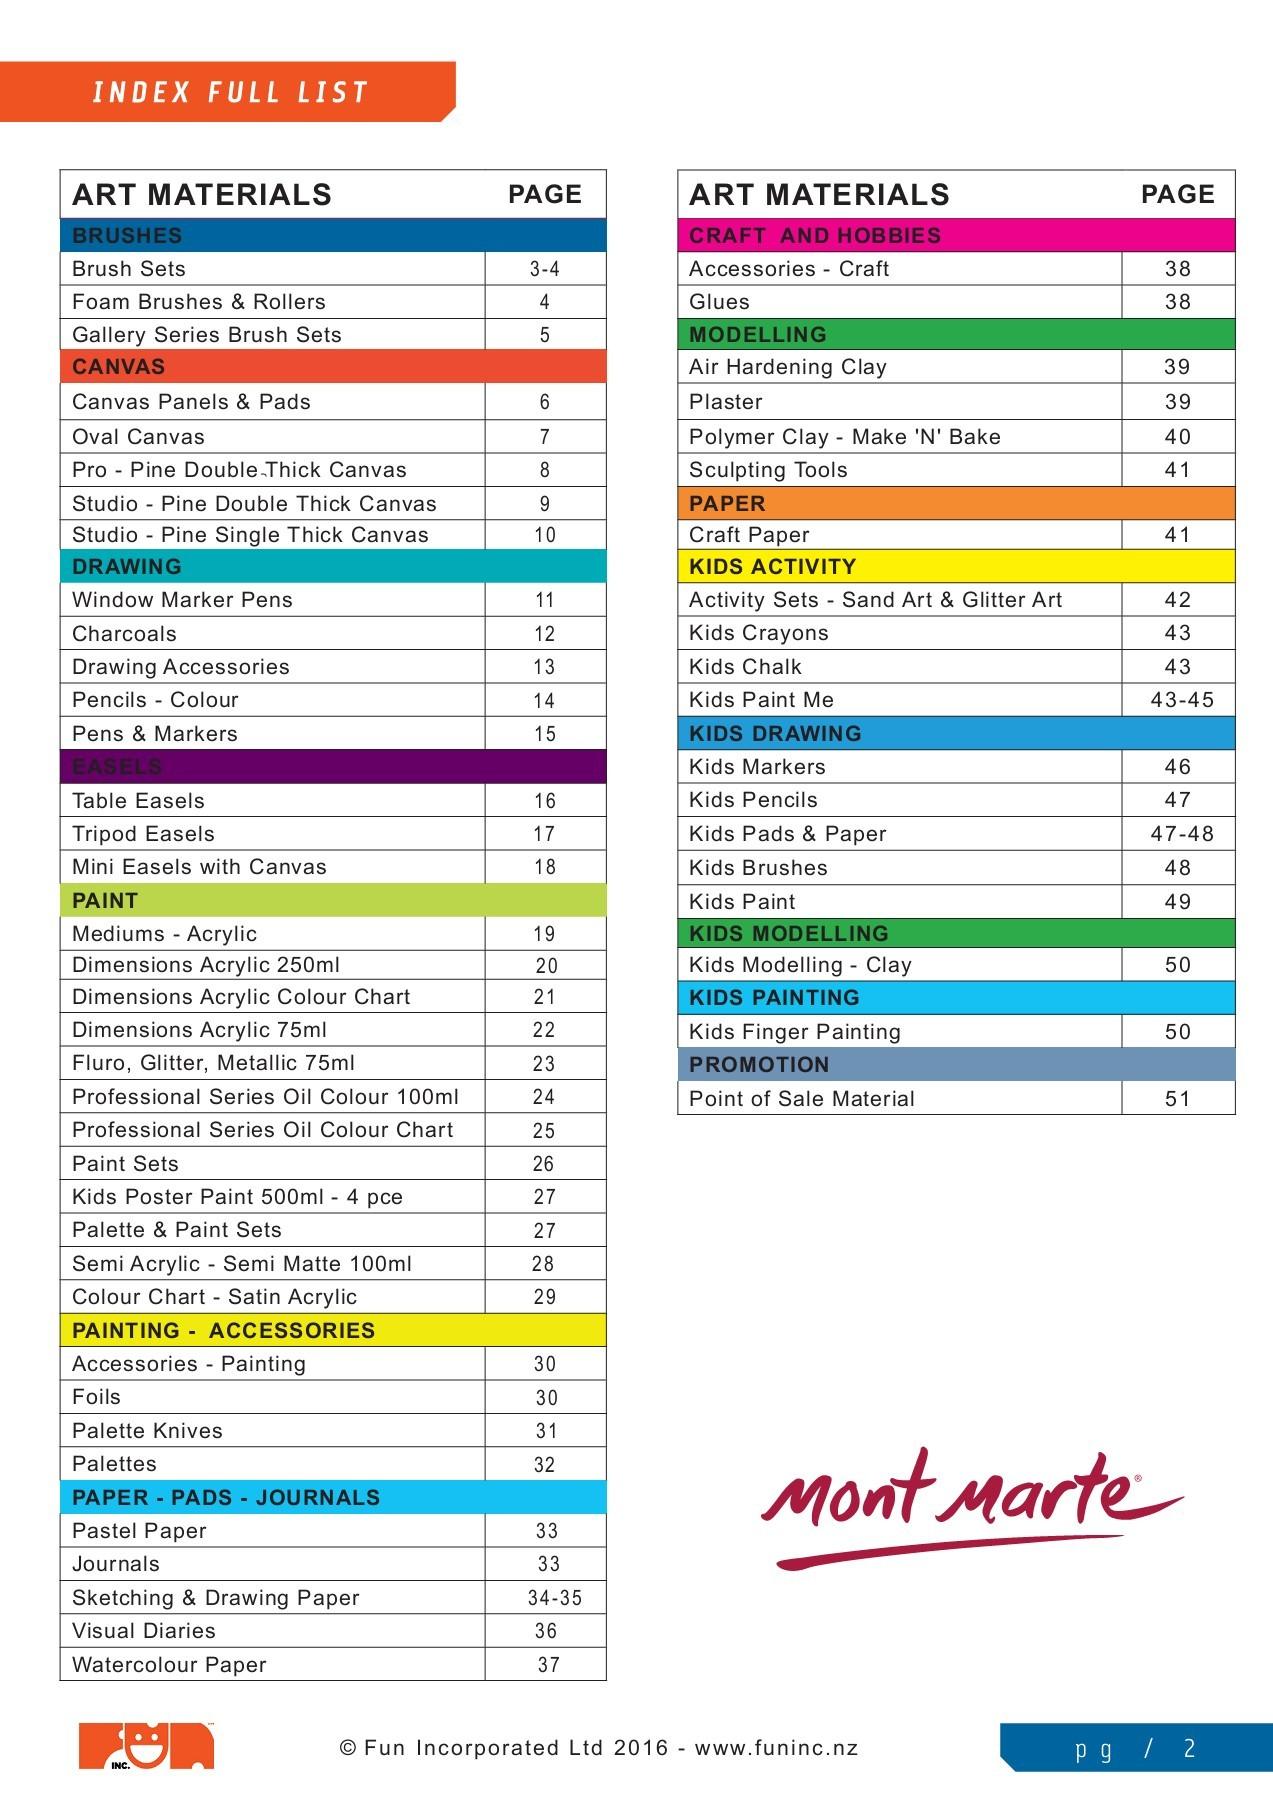 Mont Marte Artists Eraser Pack 4pce